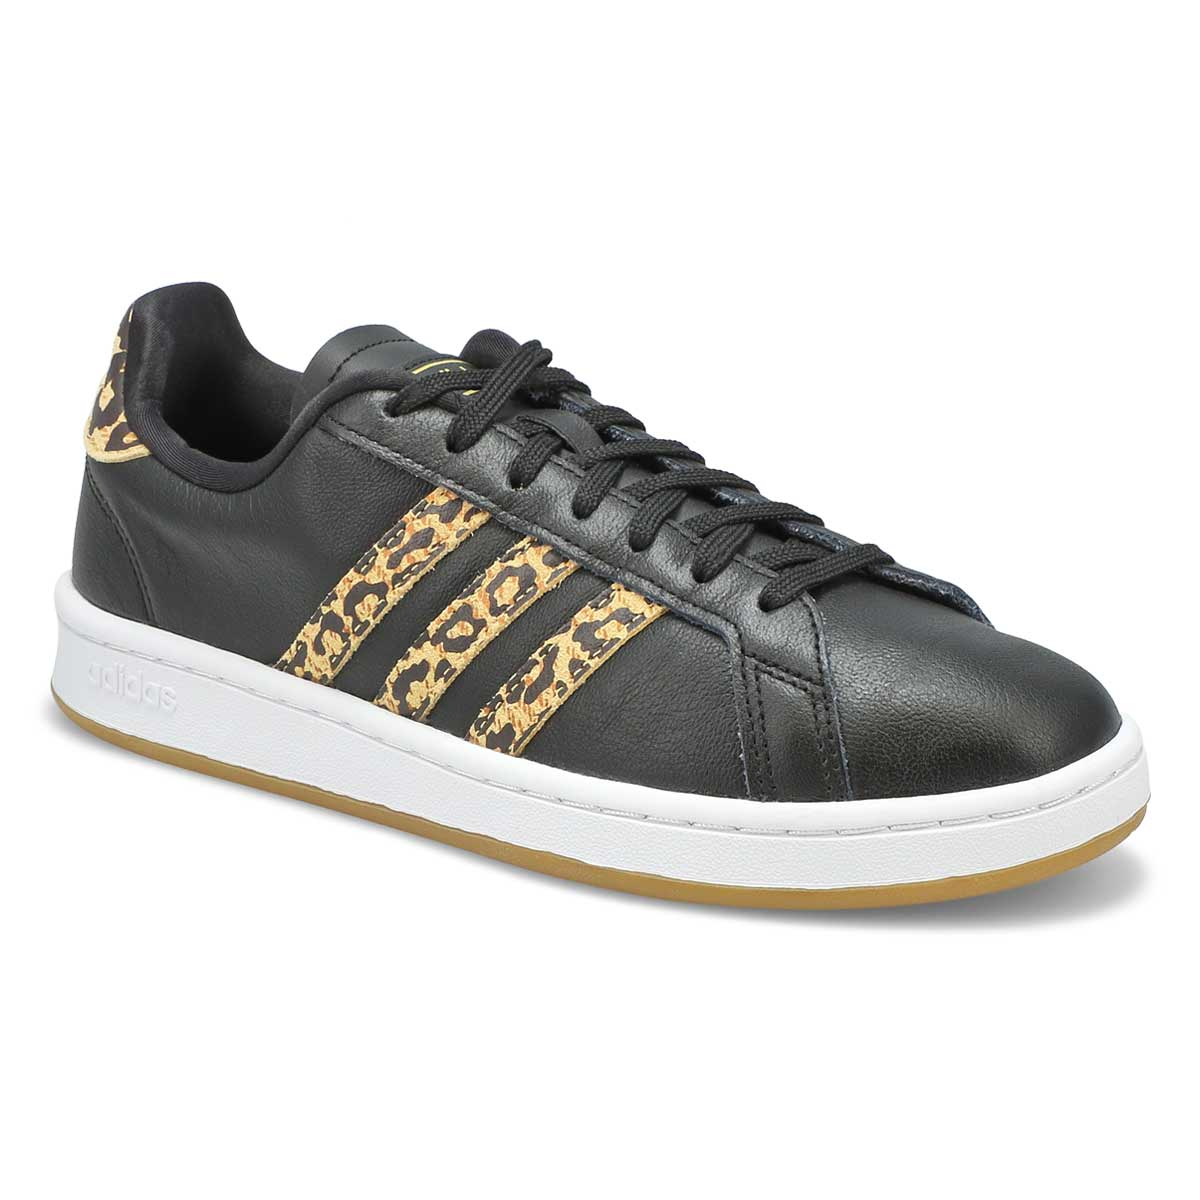 Women's GRAND COURT black/ leopard sneakers